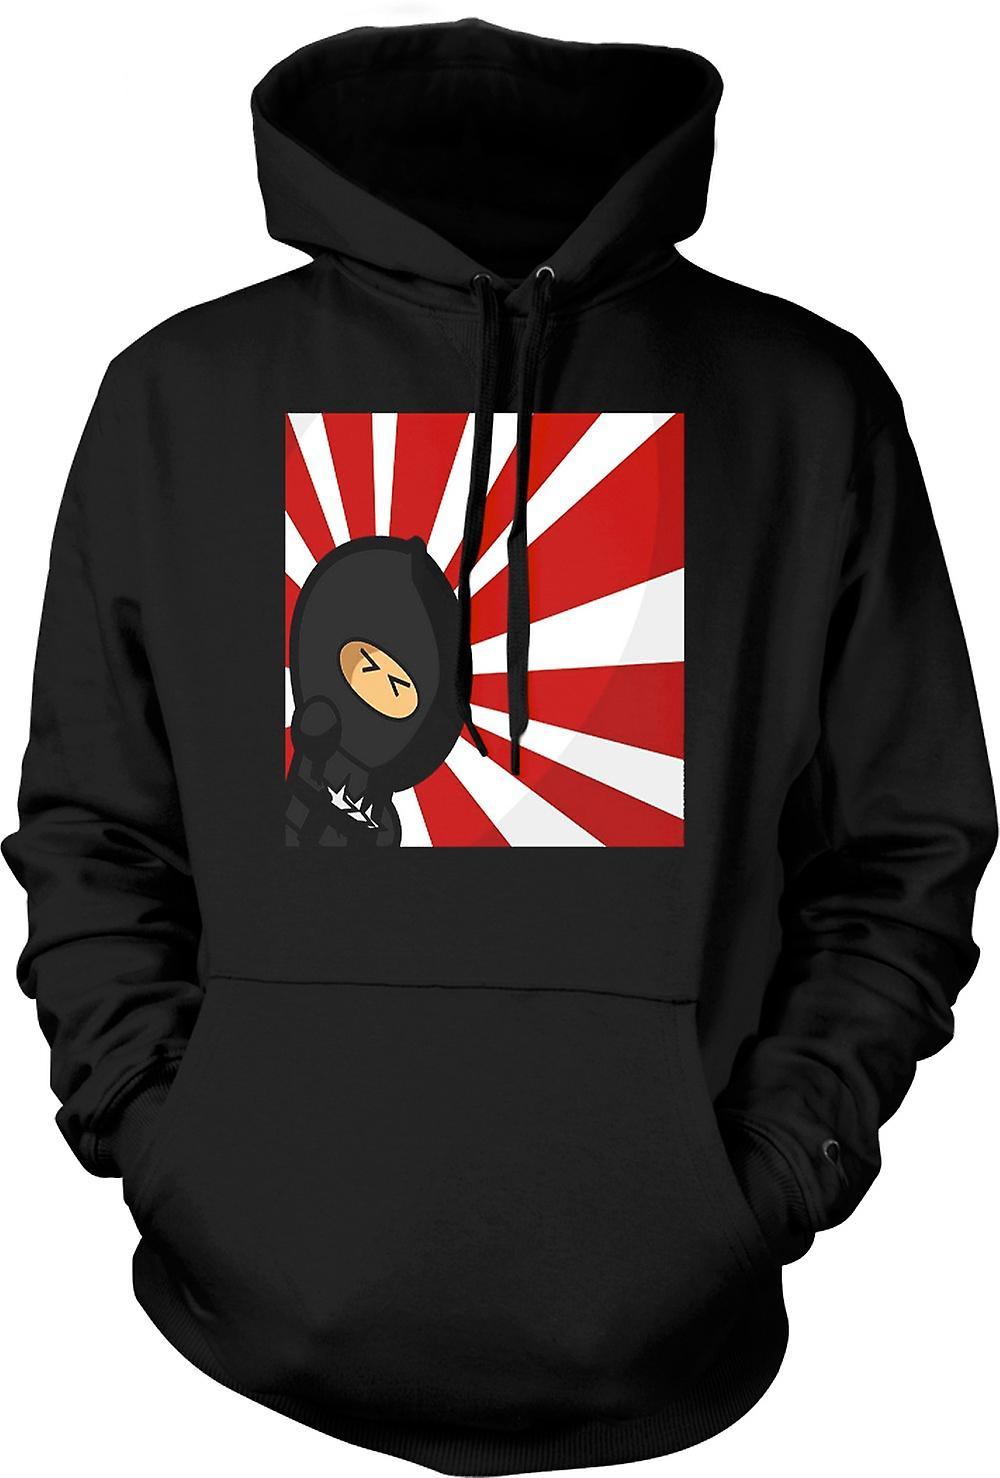 Mens Hoodie - Ninja - Pop Art - grappig